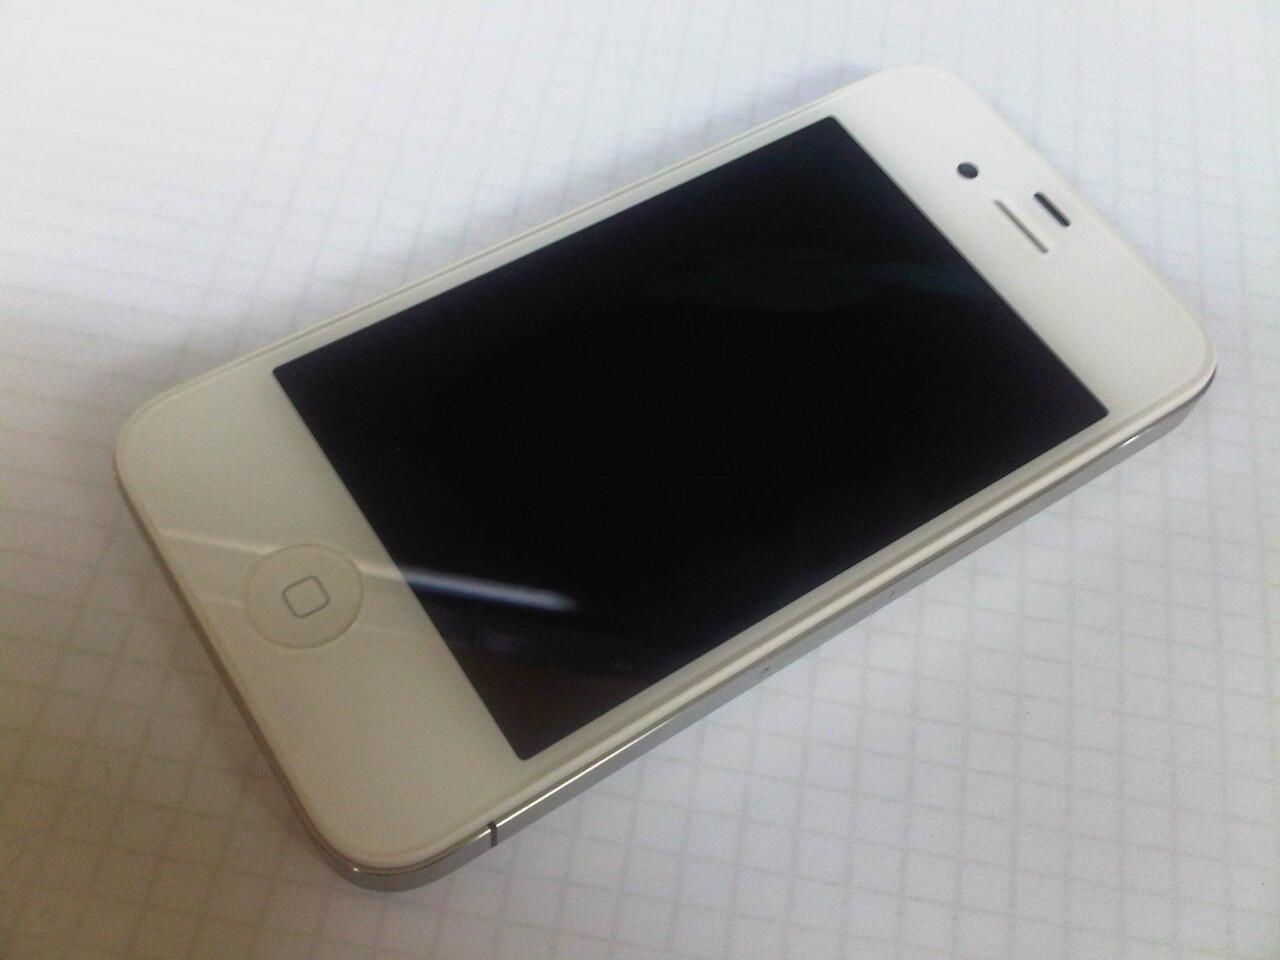 iPhone 4 16GB White FU kondisi 99% mulus banget